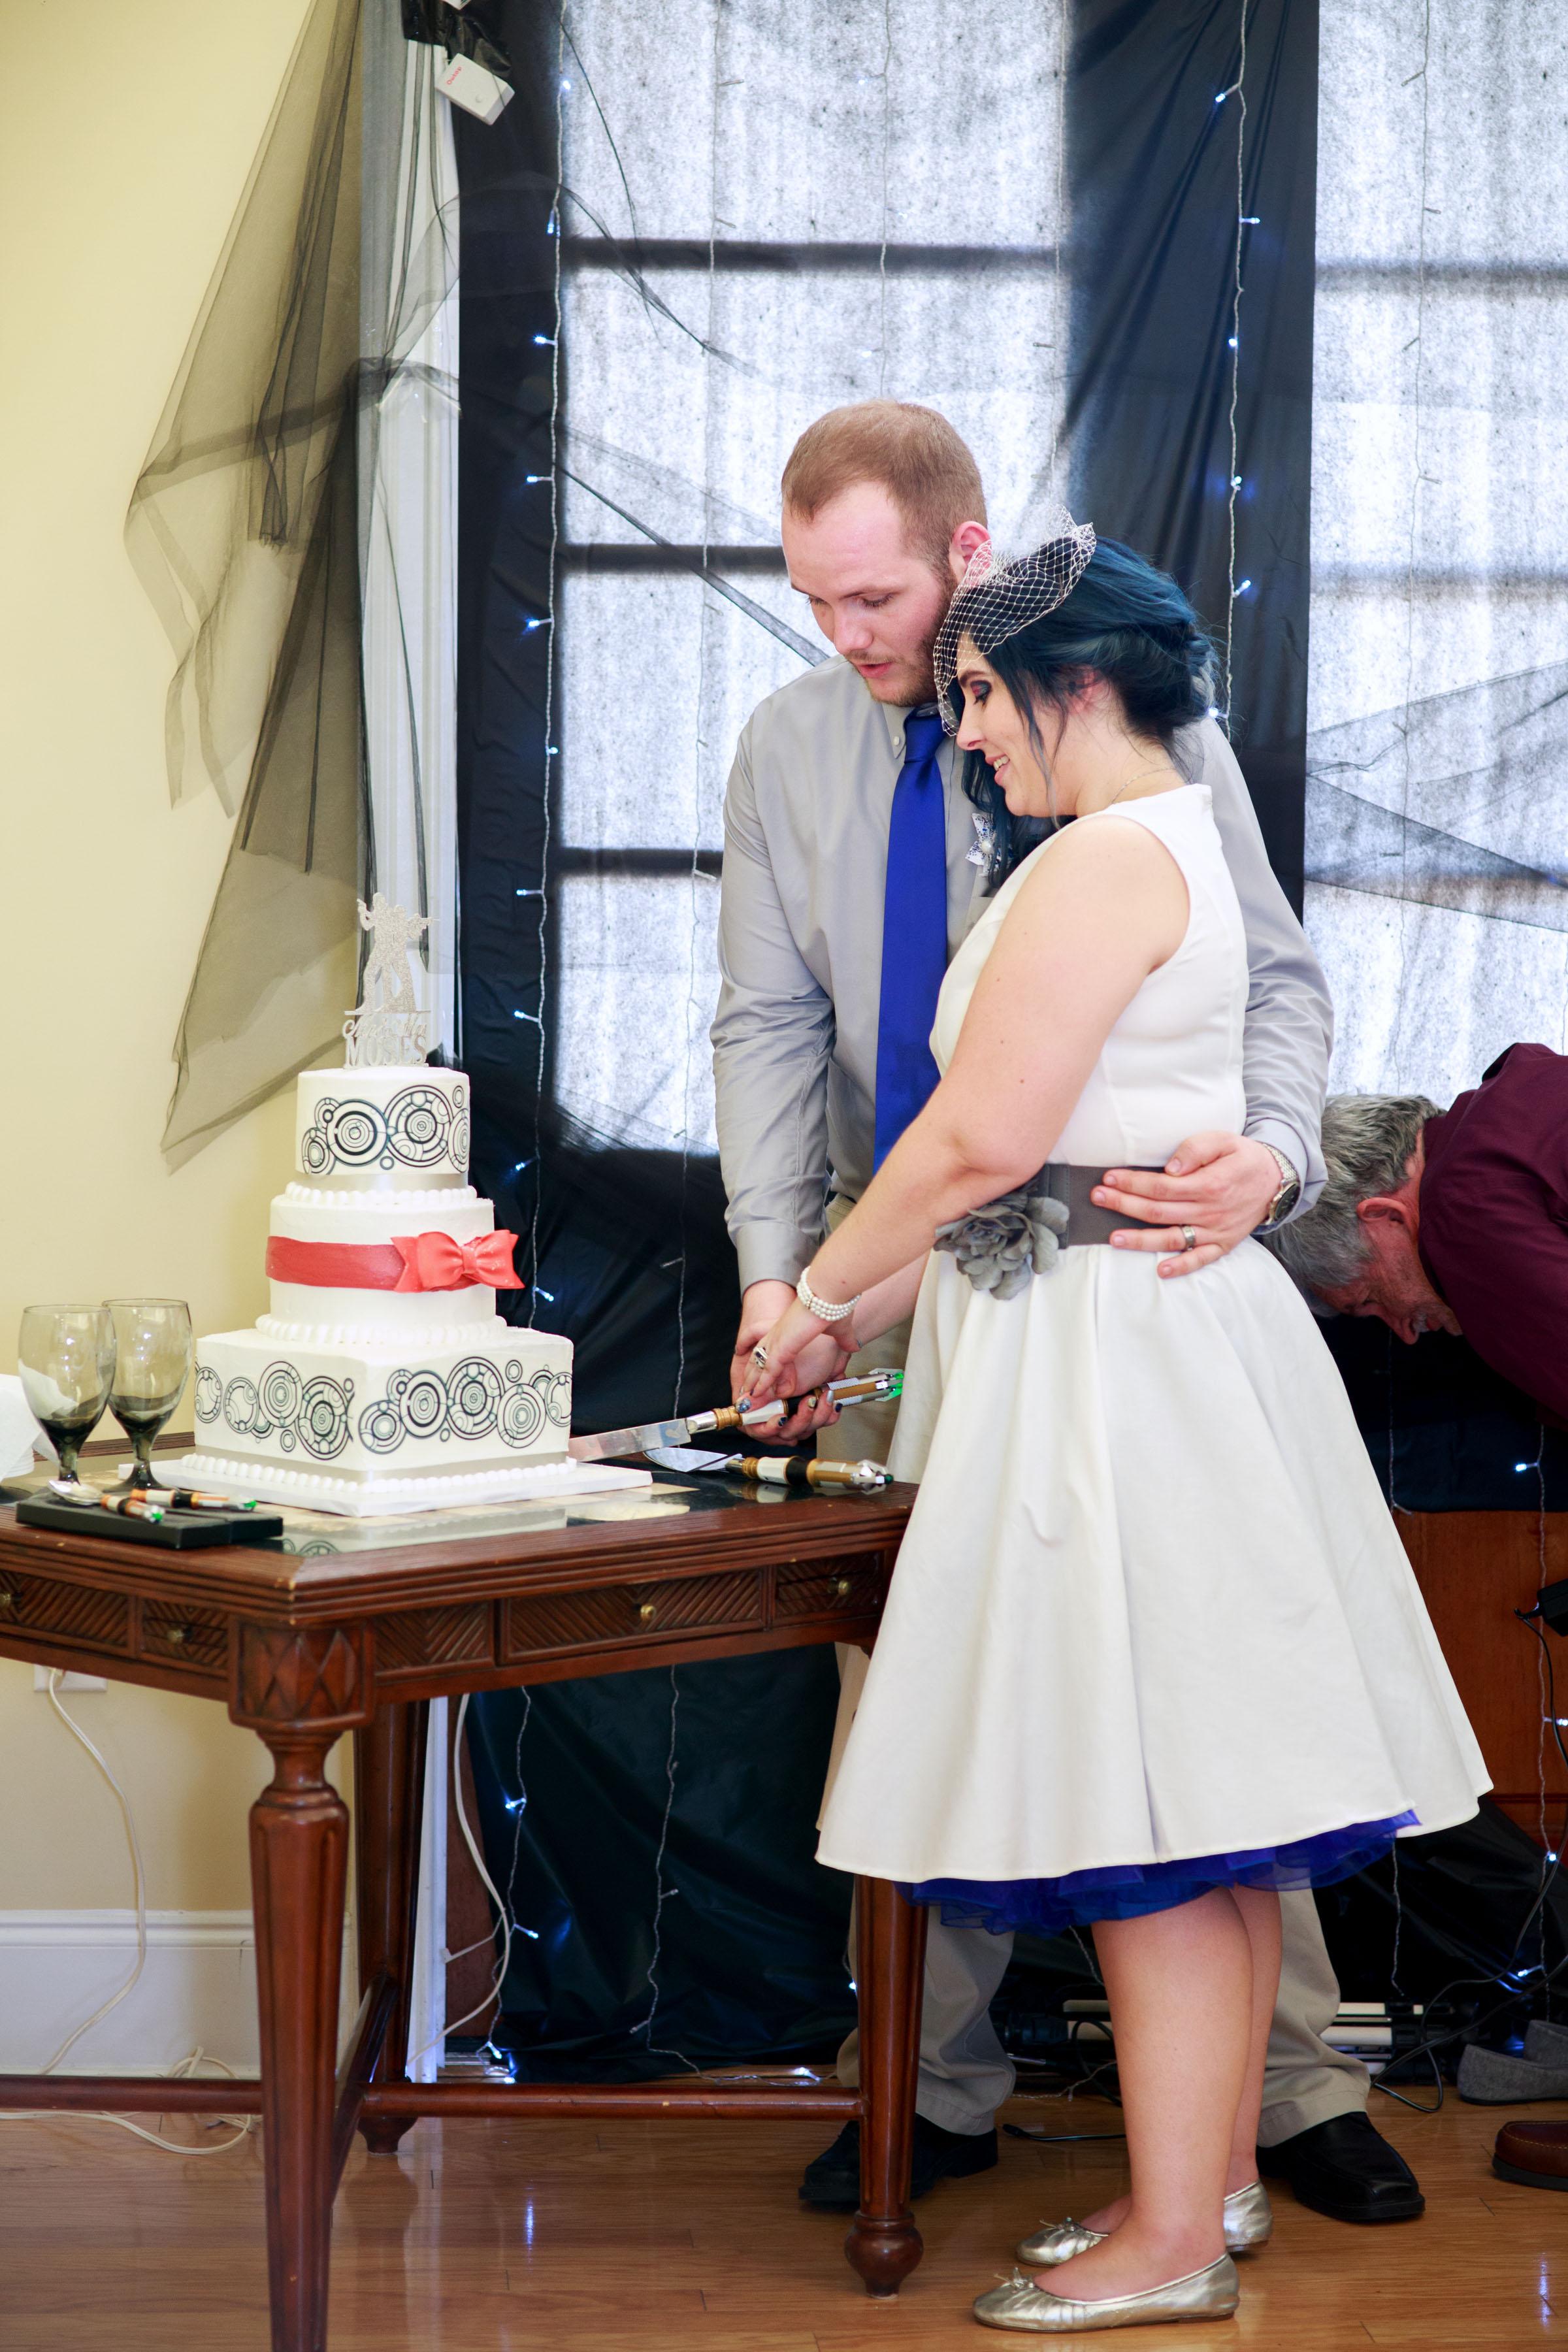 Leland_Wedding_Photographer_Tiffany_Abruzzo_Reception_41.jpg